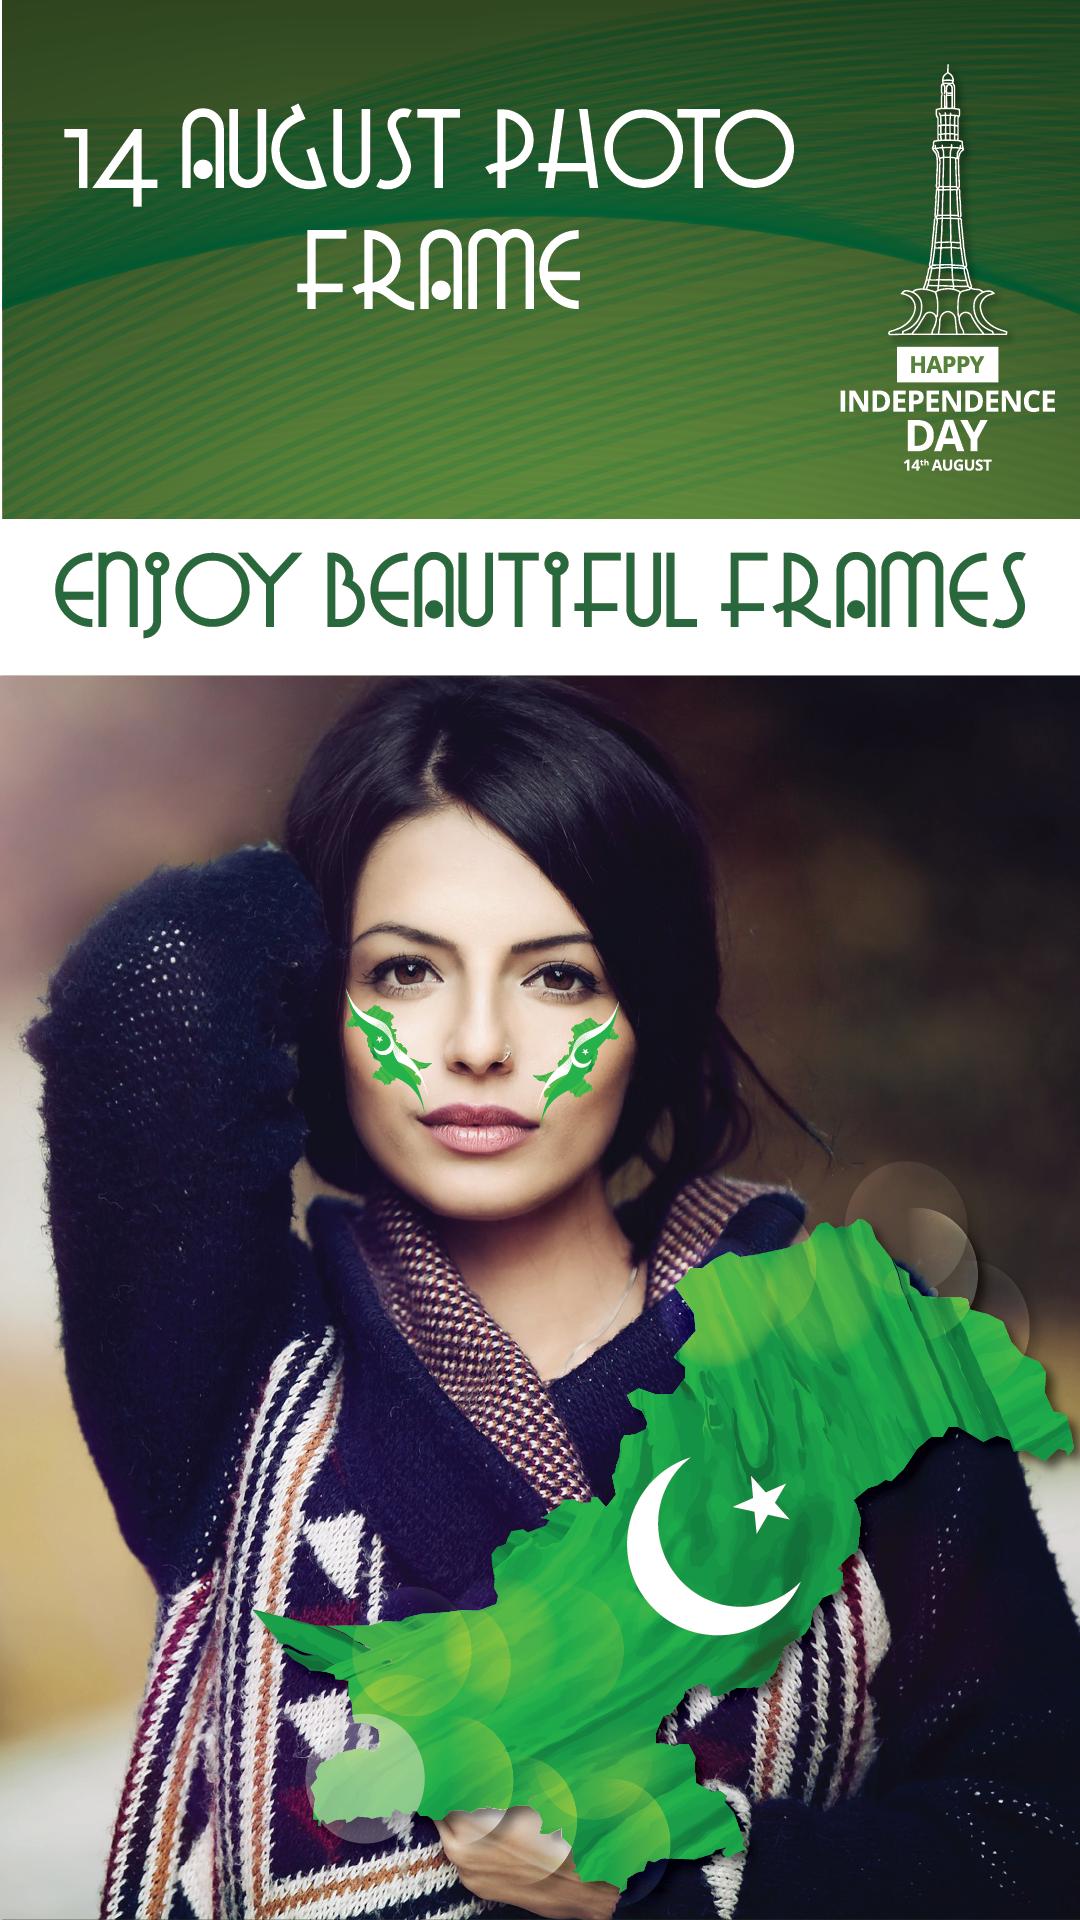 14 August Independence Day Photo Frames - Fxund us